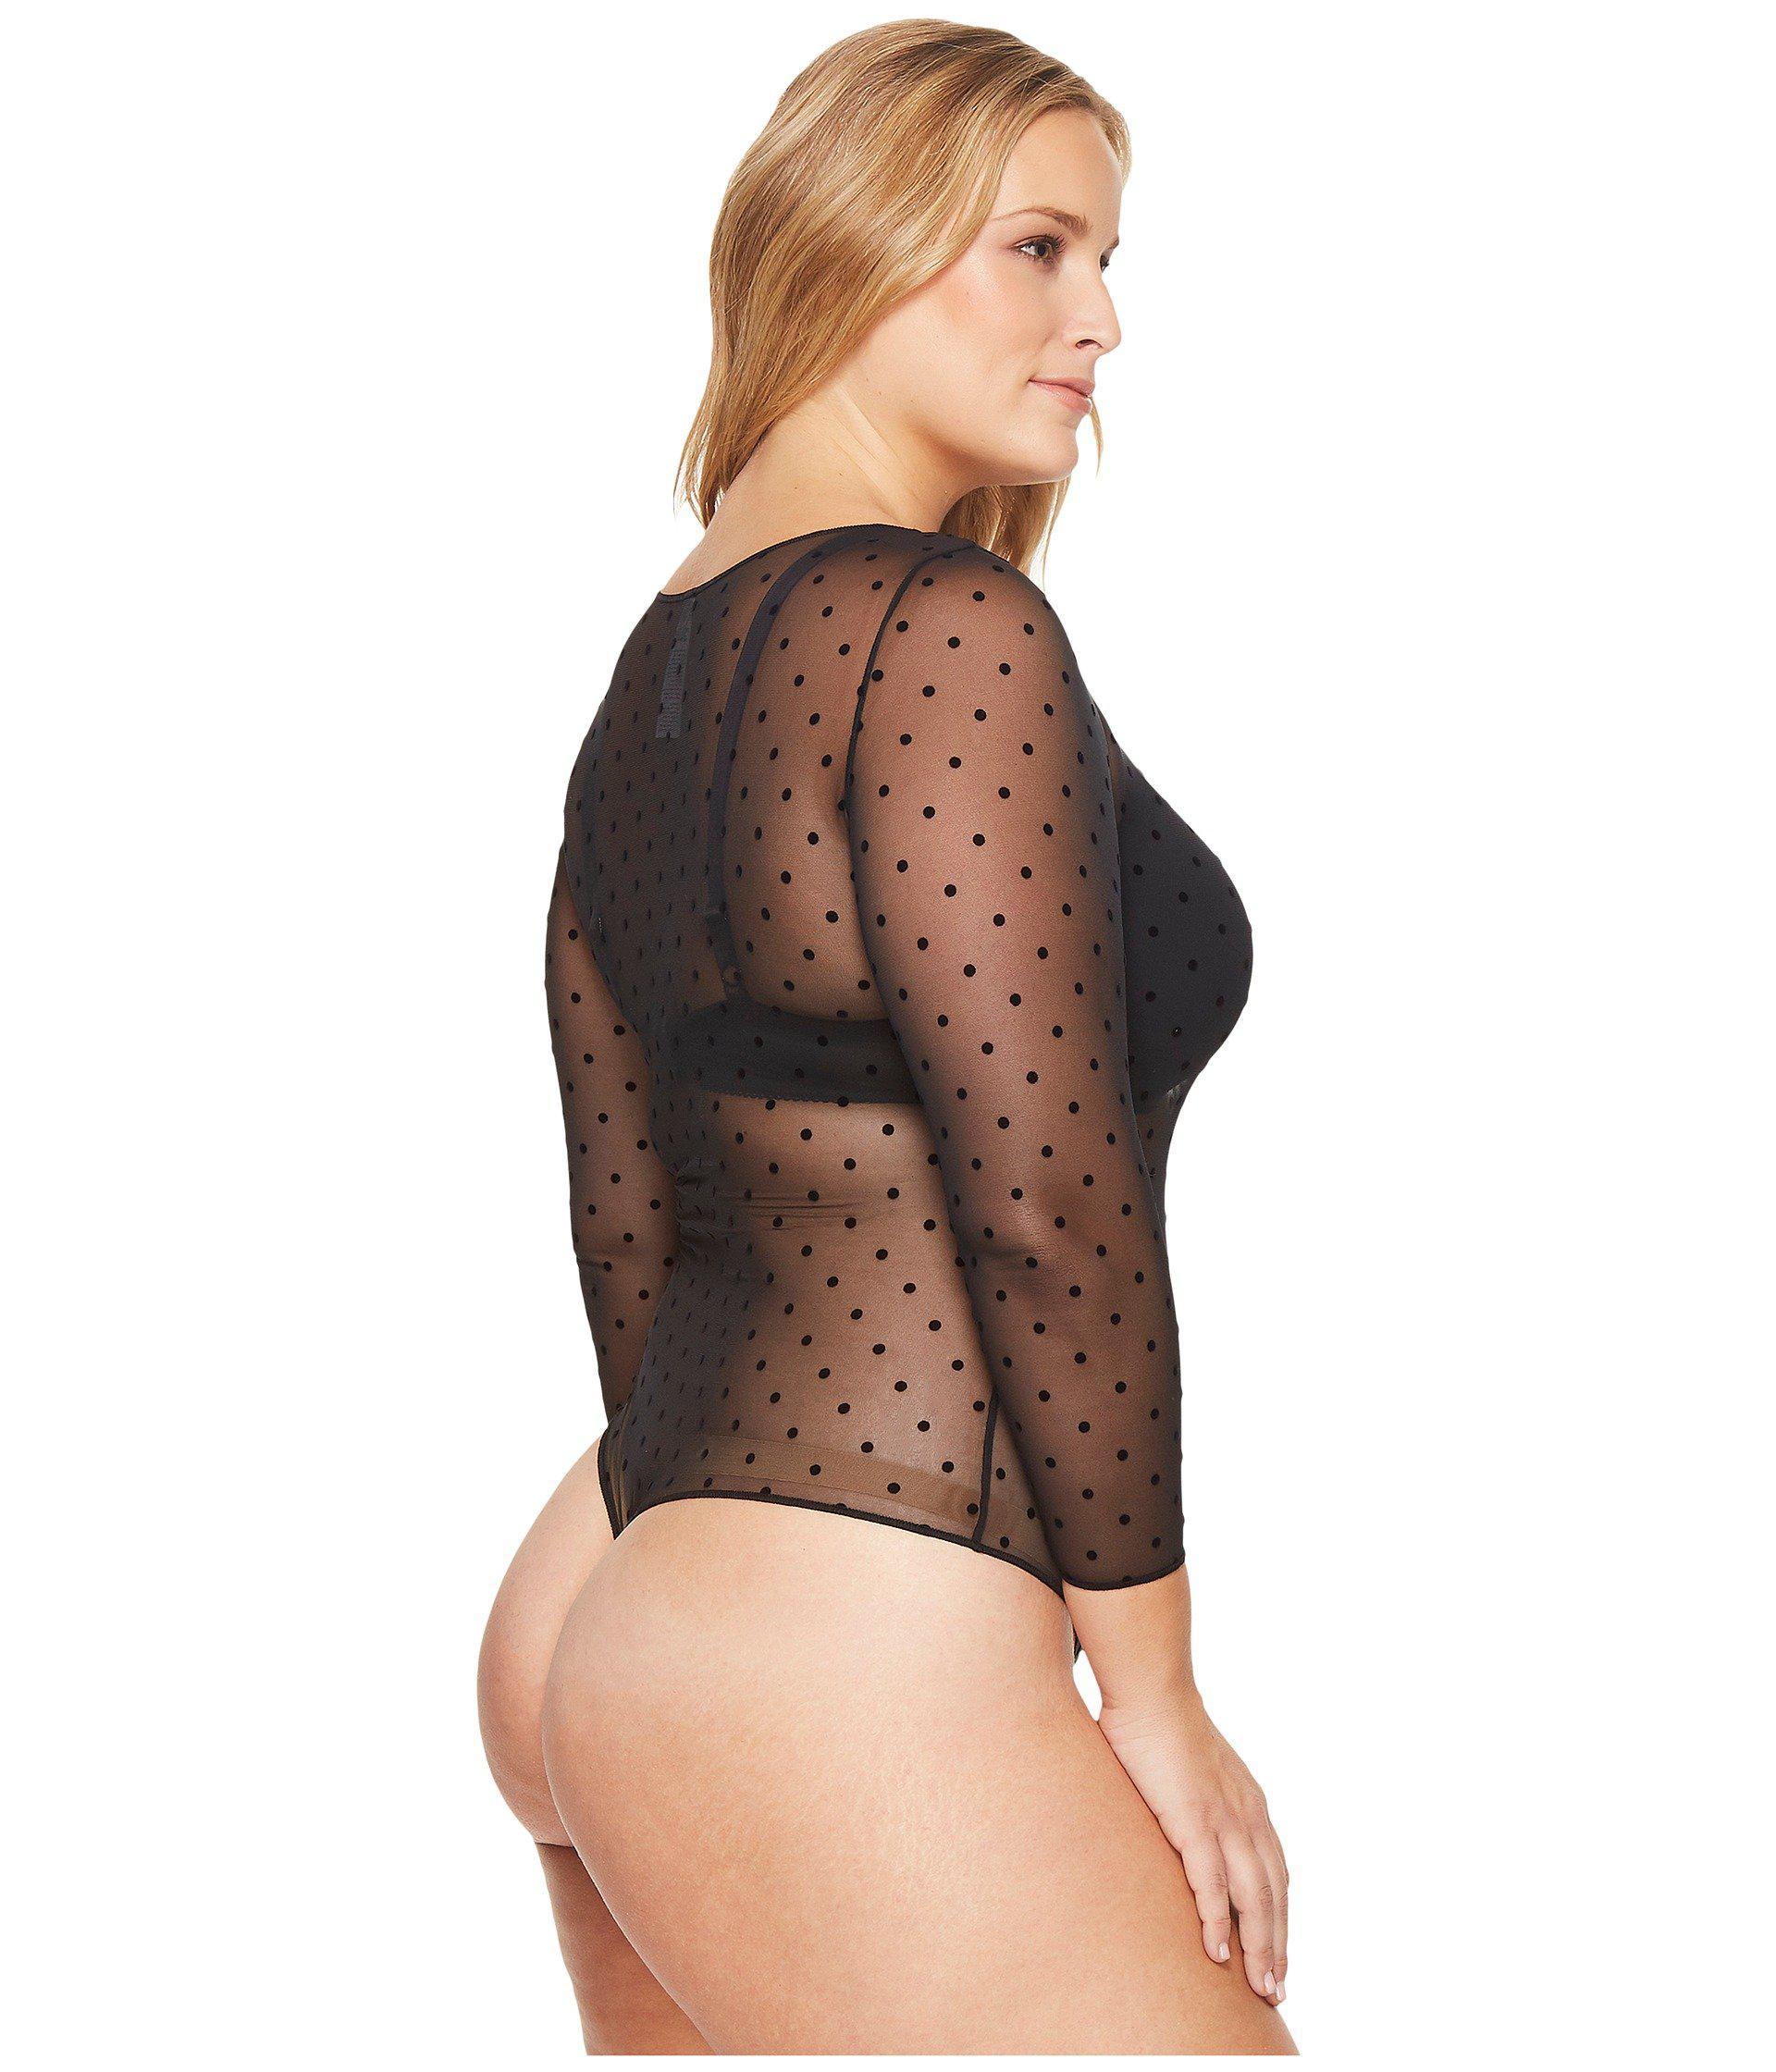 25838a51fd Spanx - Multicolor Plus Size Sheer Fashion Mesh Thong Bodysuit (flocked  Dot) Women s Jumpsuit. View fullscreen